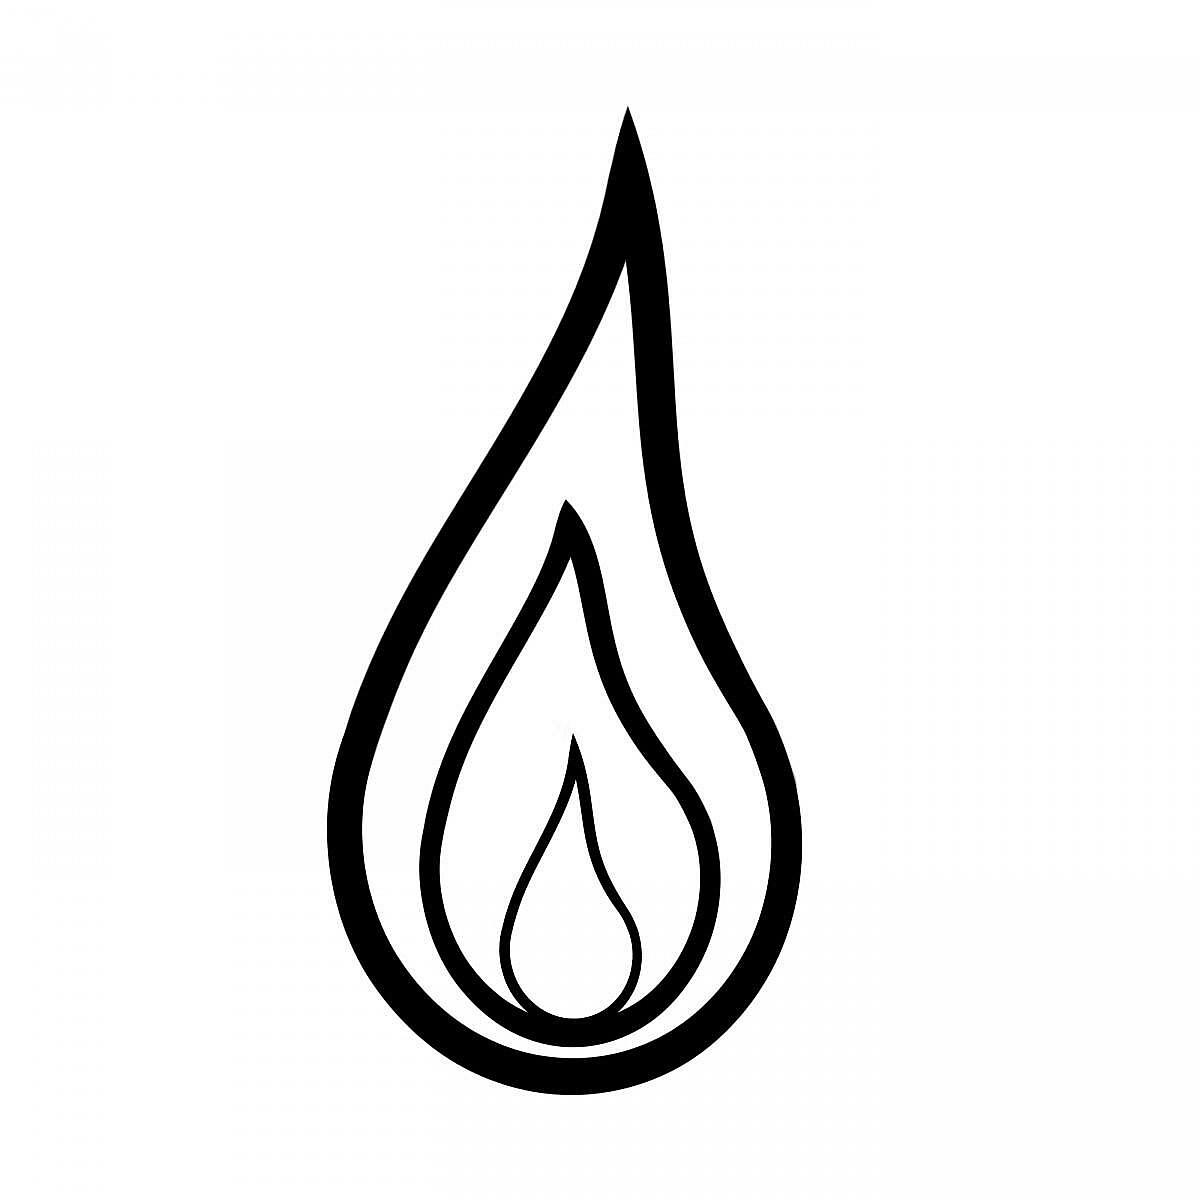 TheSouthernFlame - ArtsCraftVendorApplication - 24782